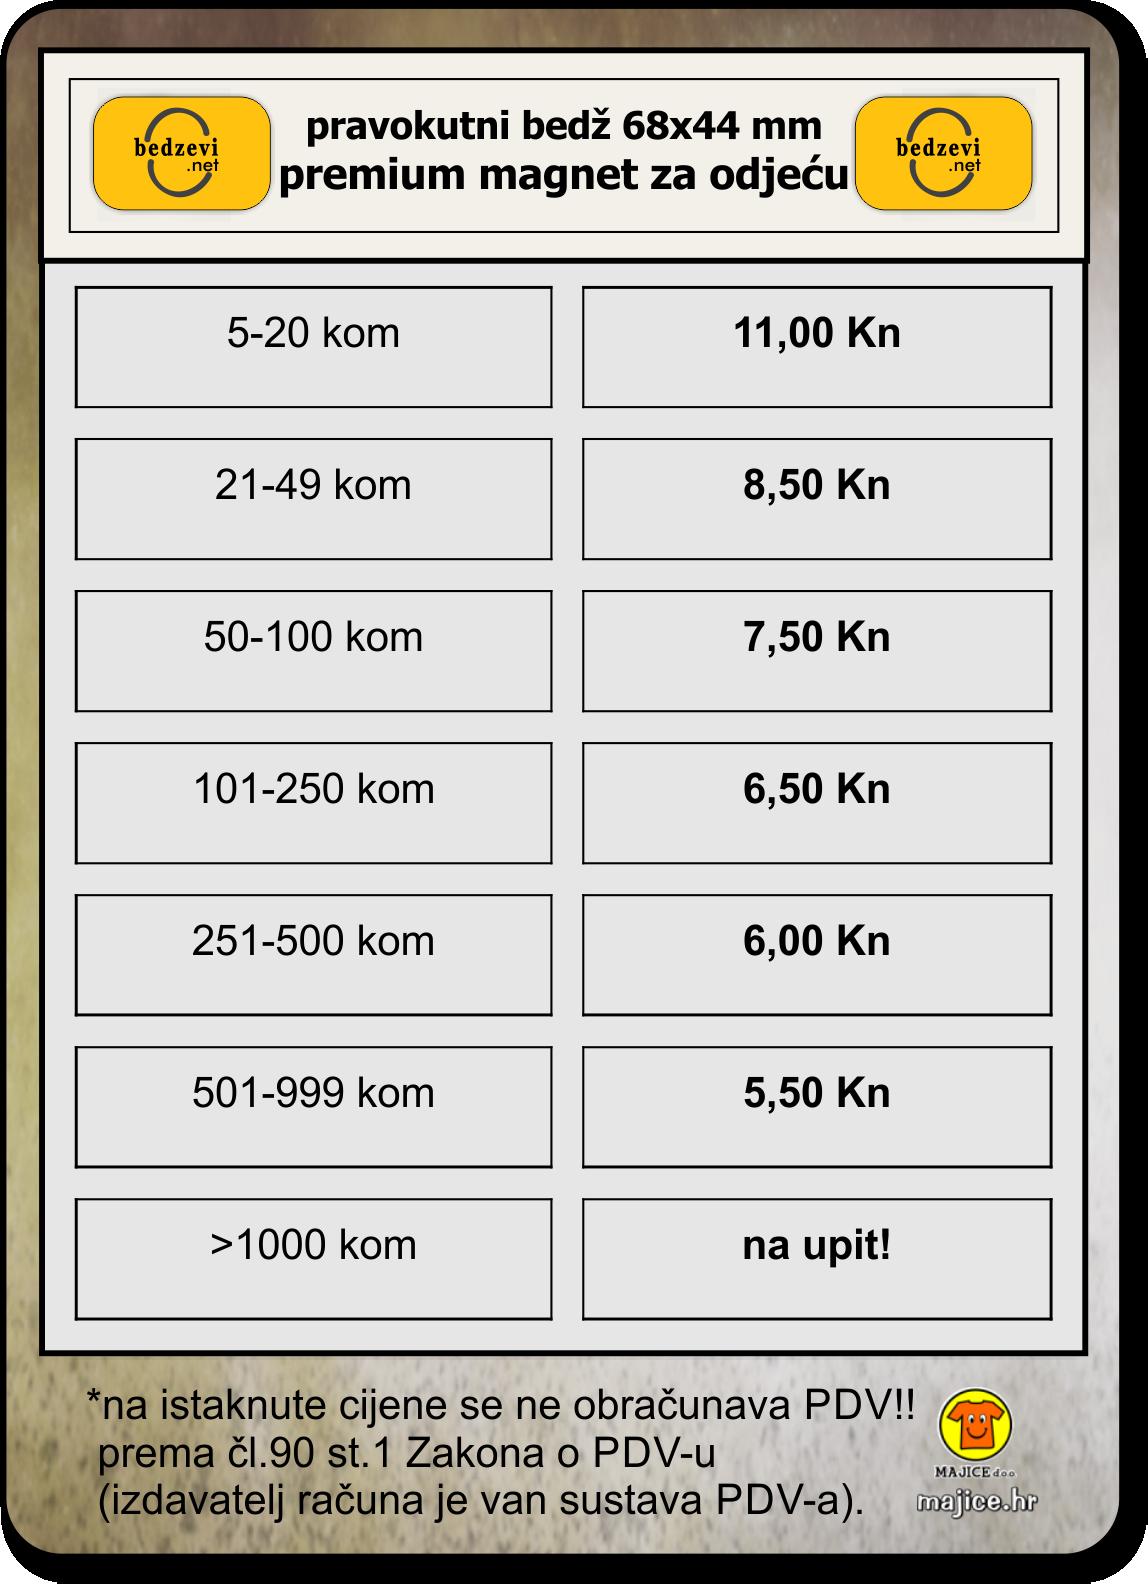 cjenik bedževa za web_68x44mm_premium magnet za odjeću_png